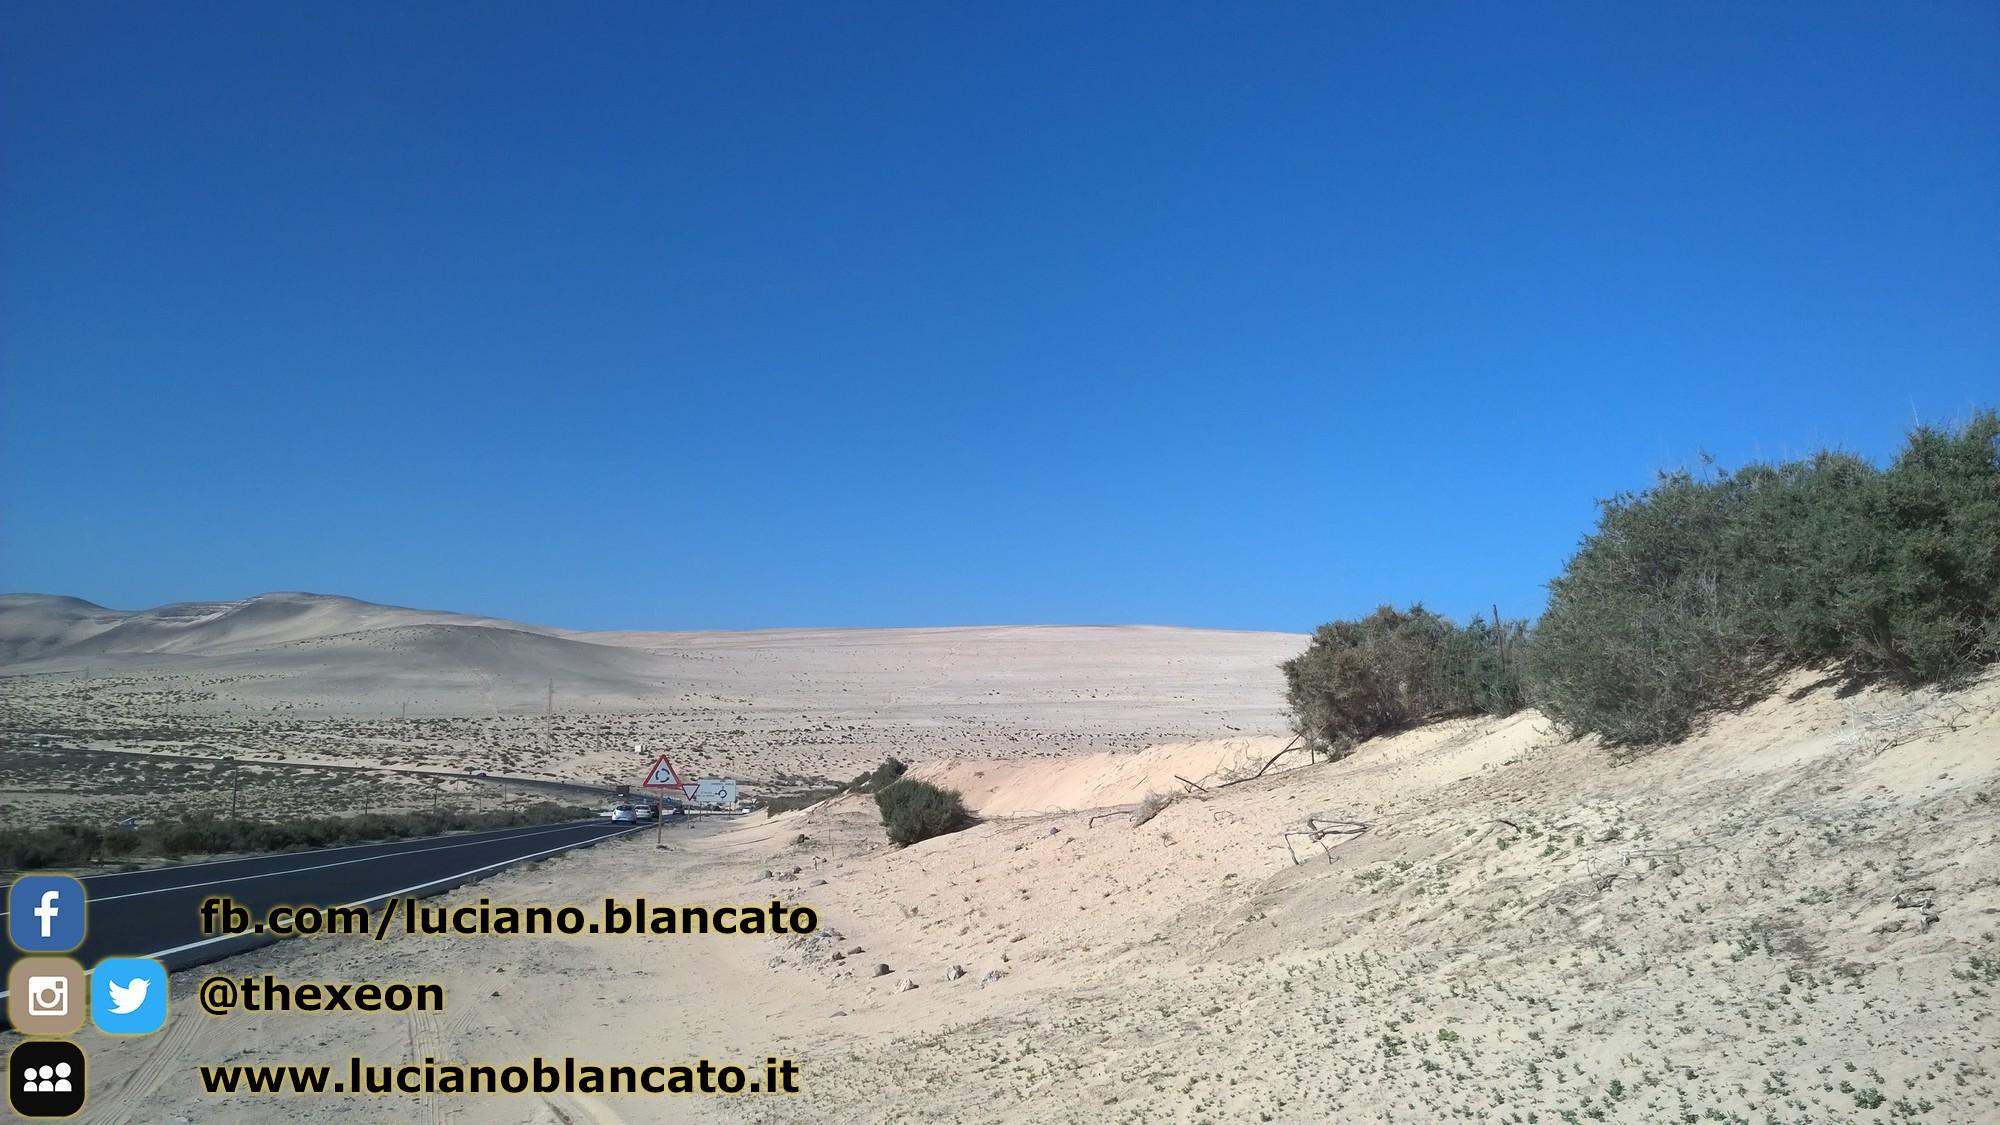 Fuerteventura - Spagna - 2014 - foto n. 0052